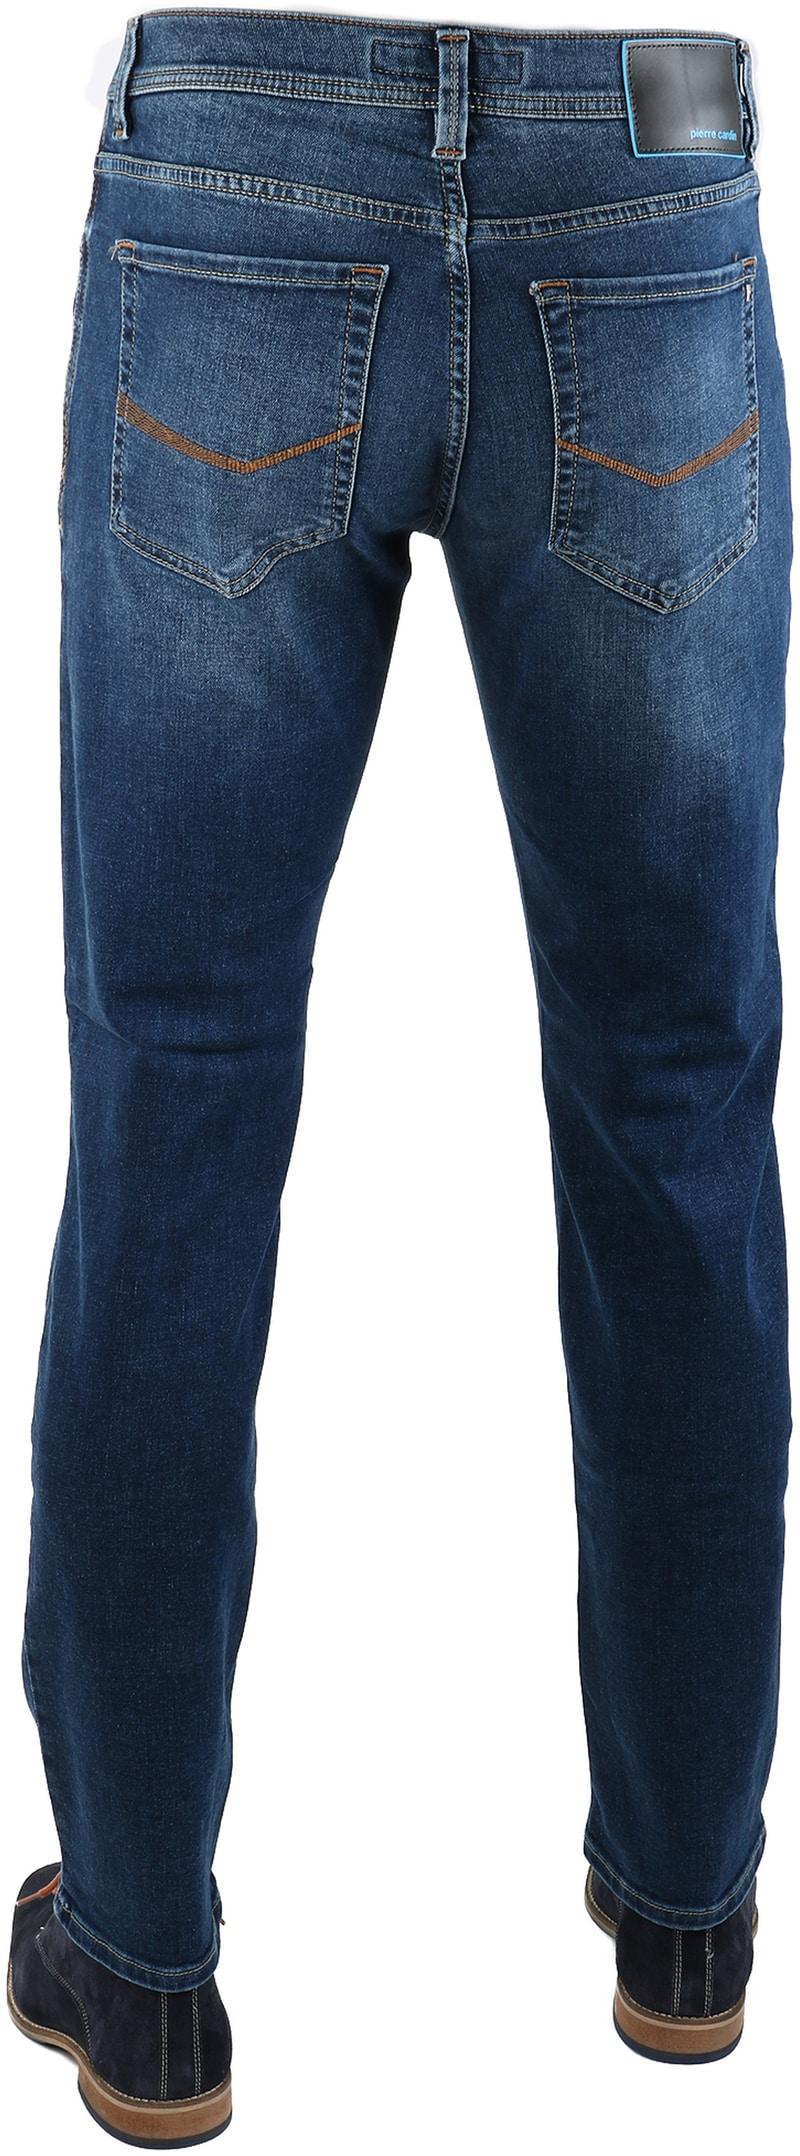 Pierre Cardin Lyon Jeans Future Flex 3451 photo 3